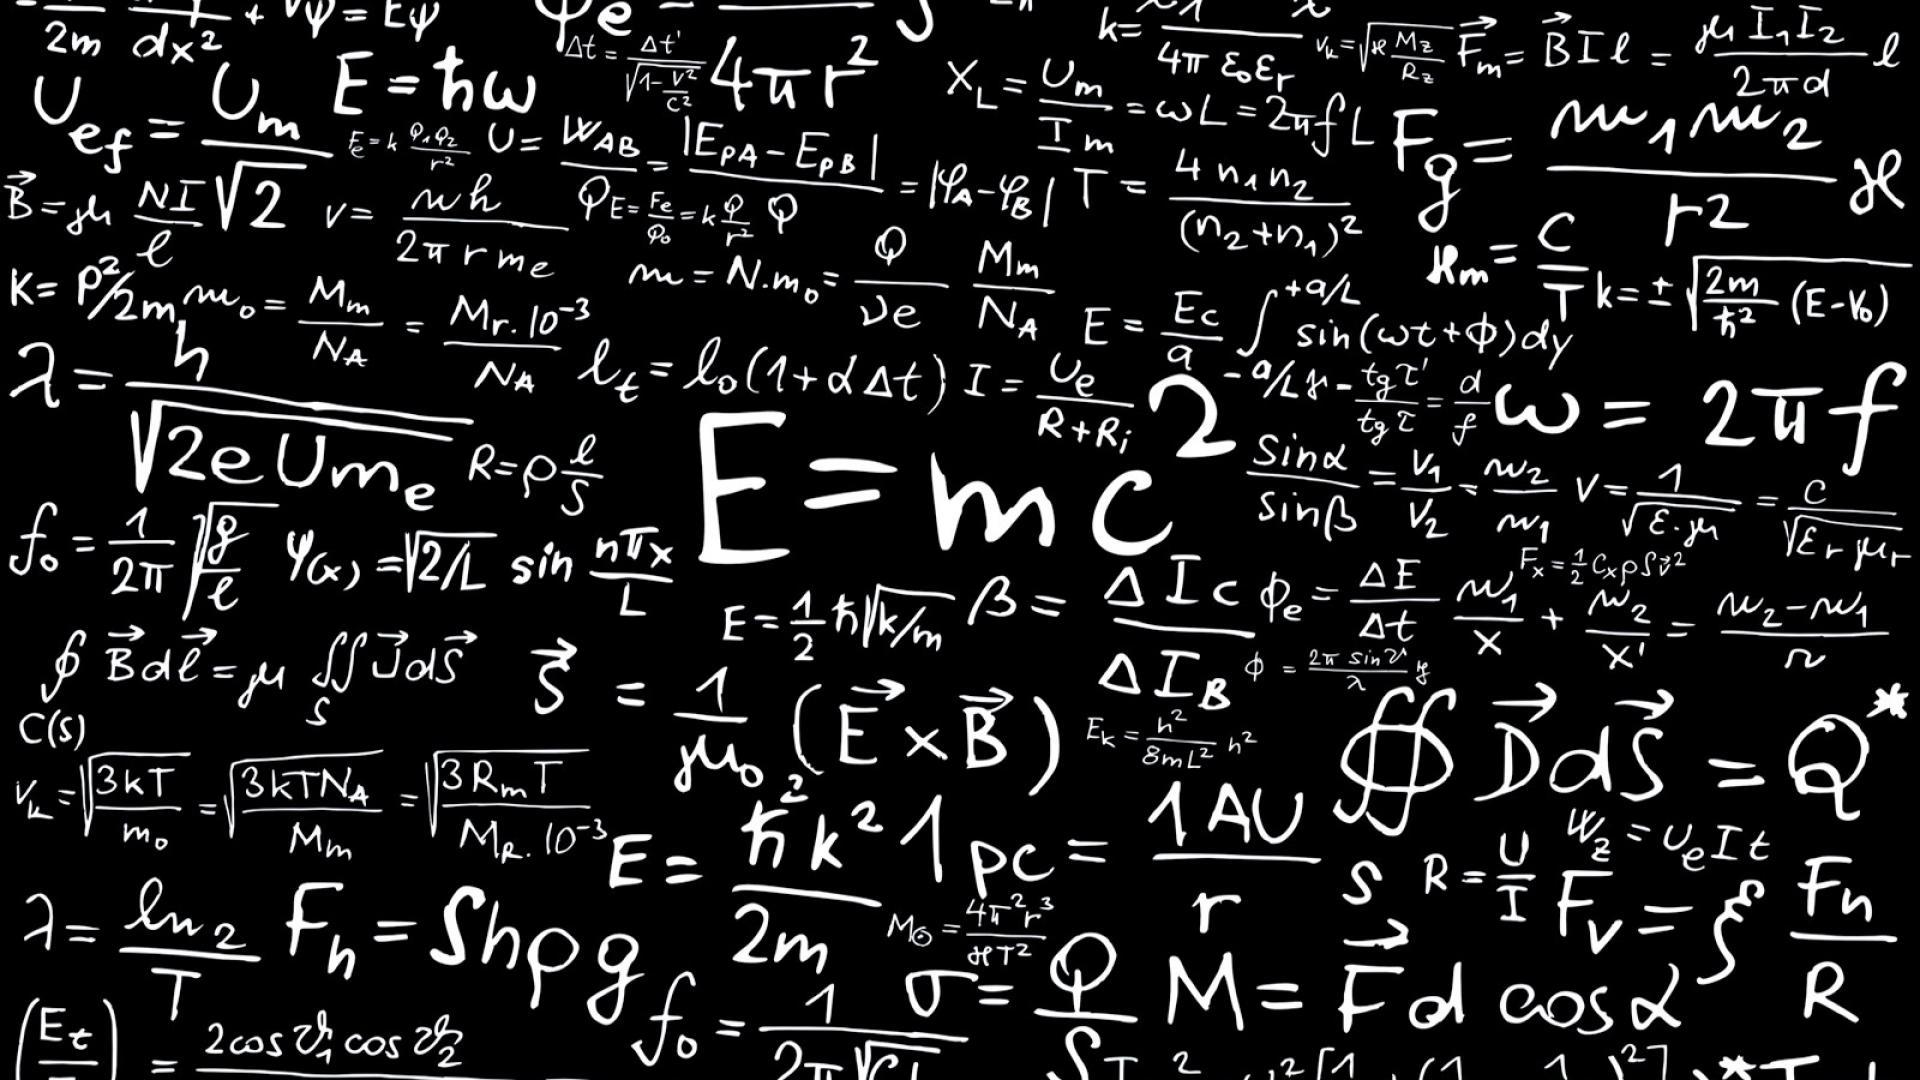 Math Equation Wallpaper - WallpaperSafari